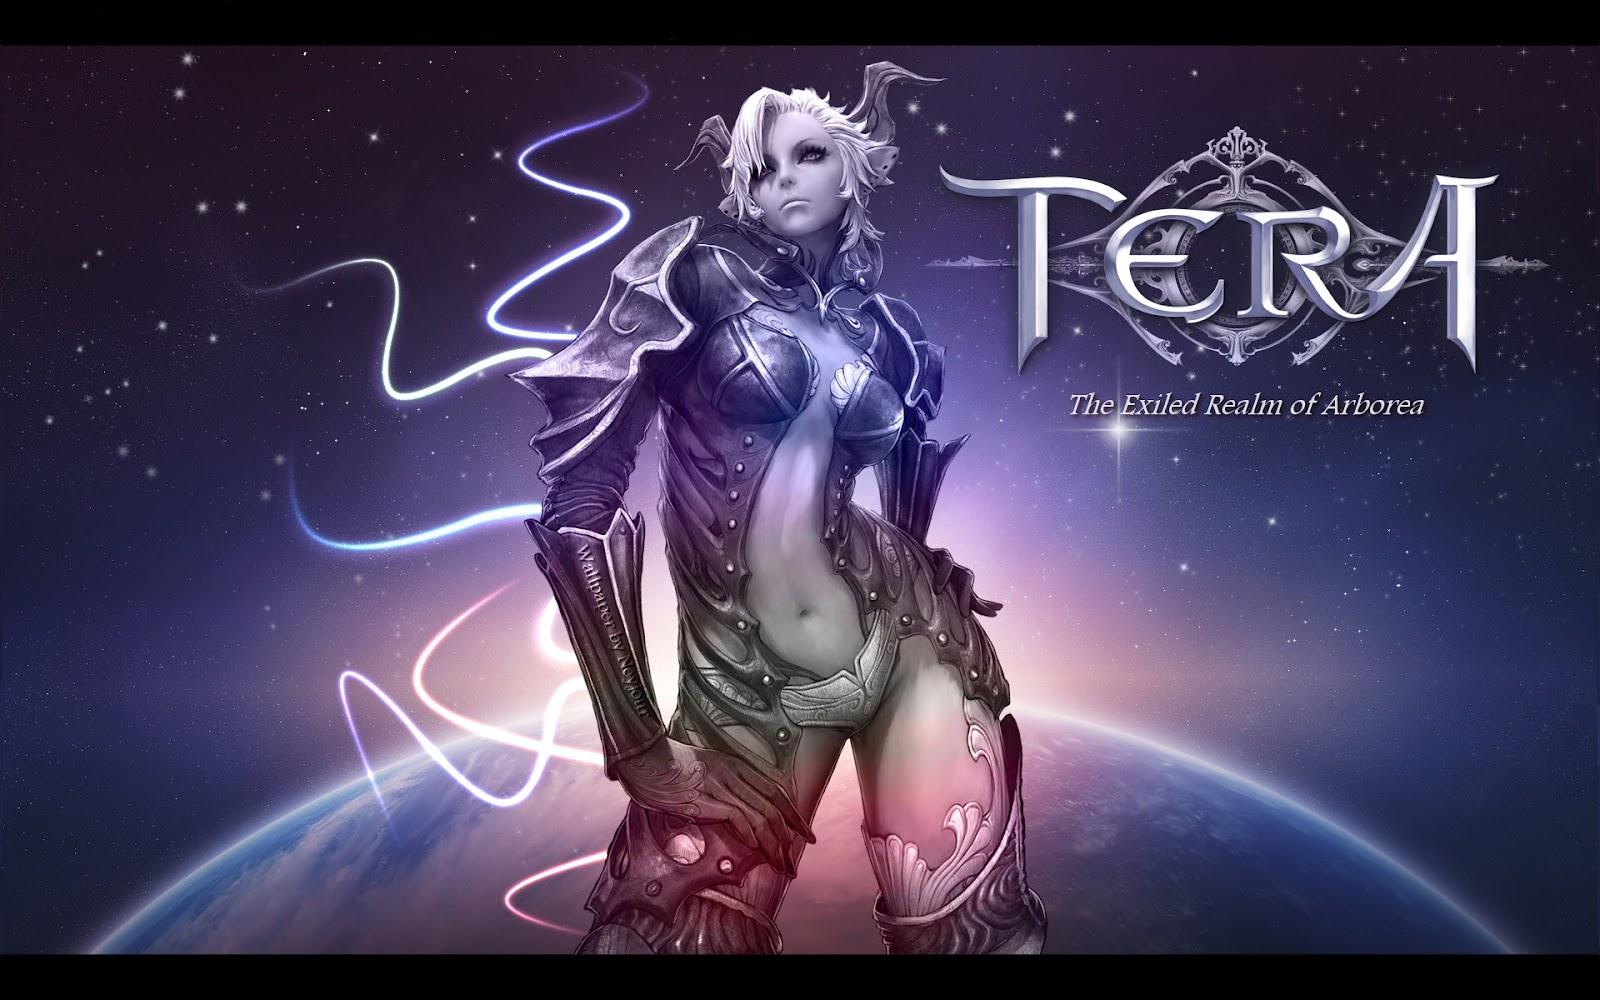 http://3.bp.blogspot.com/-BAcwJ8quJIU/UA0XZWEaZ7I/AAAAAAAAALY/1Rd9_LCXE-c/s1600/Tera_Online_wallpaper_tera_castanic_wallpaper_03_by_neyjour-d30sco7.jpg